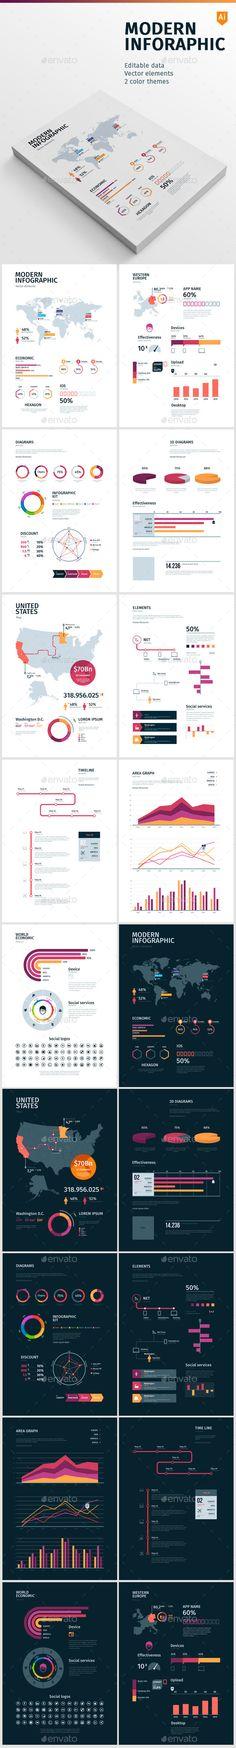 Modern Infographic - Infographics